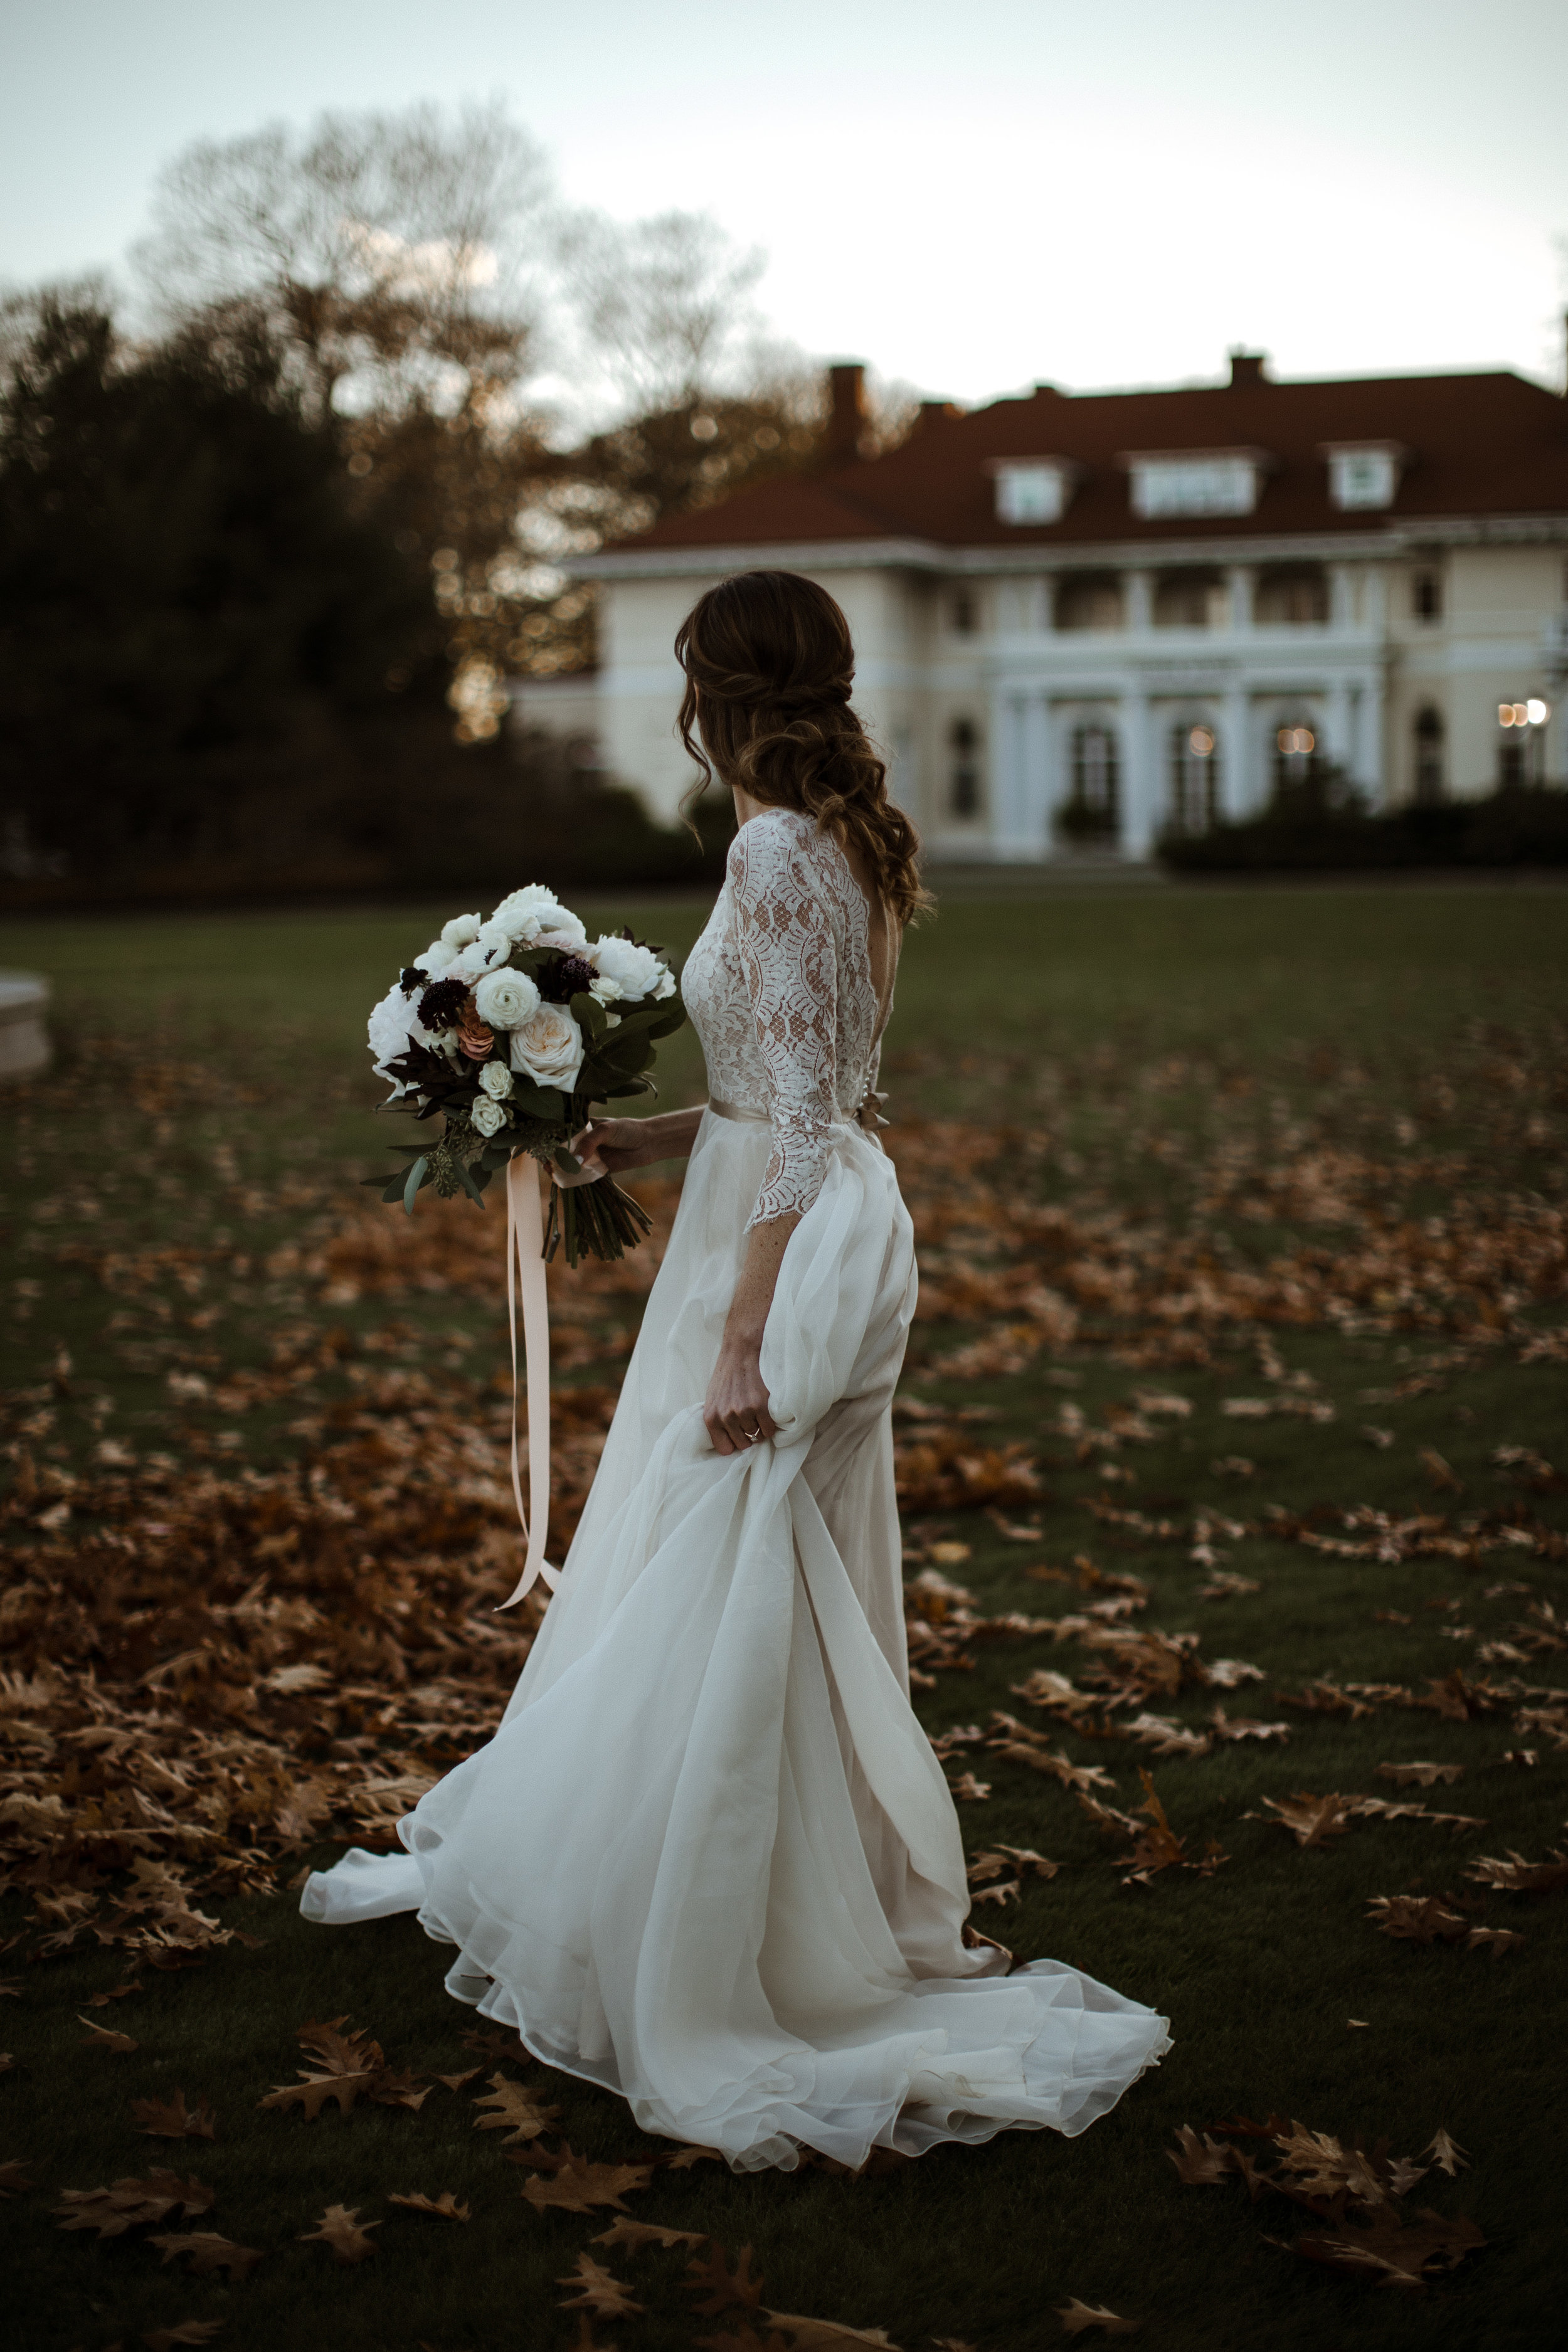 beverly_ma_wedding-35.jpg